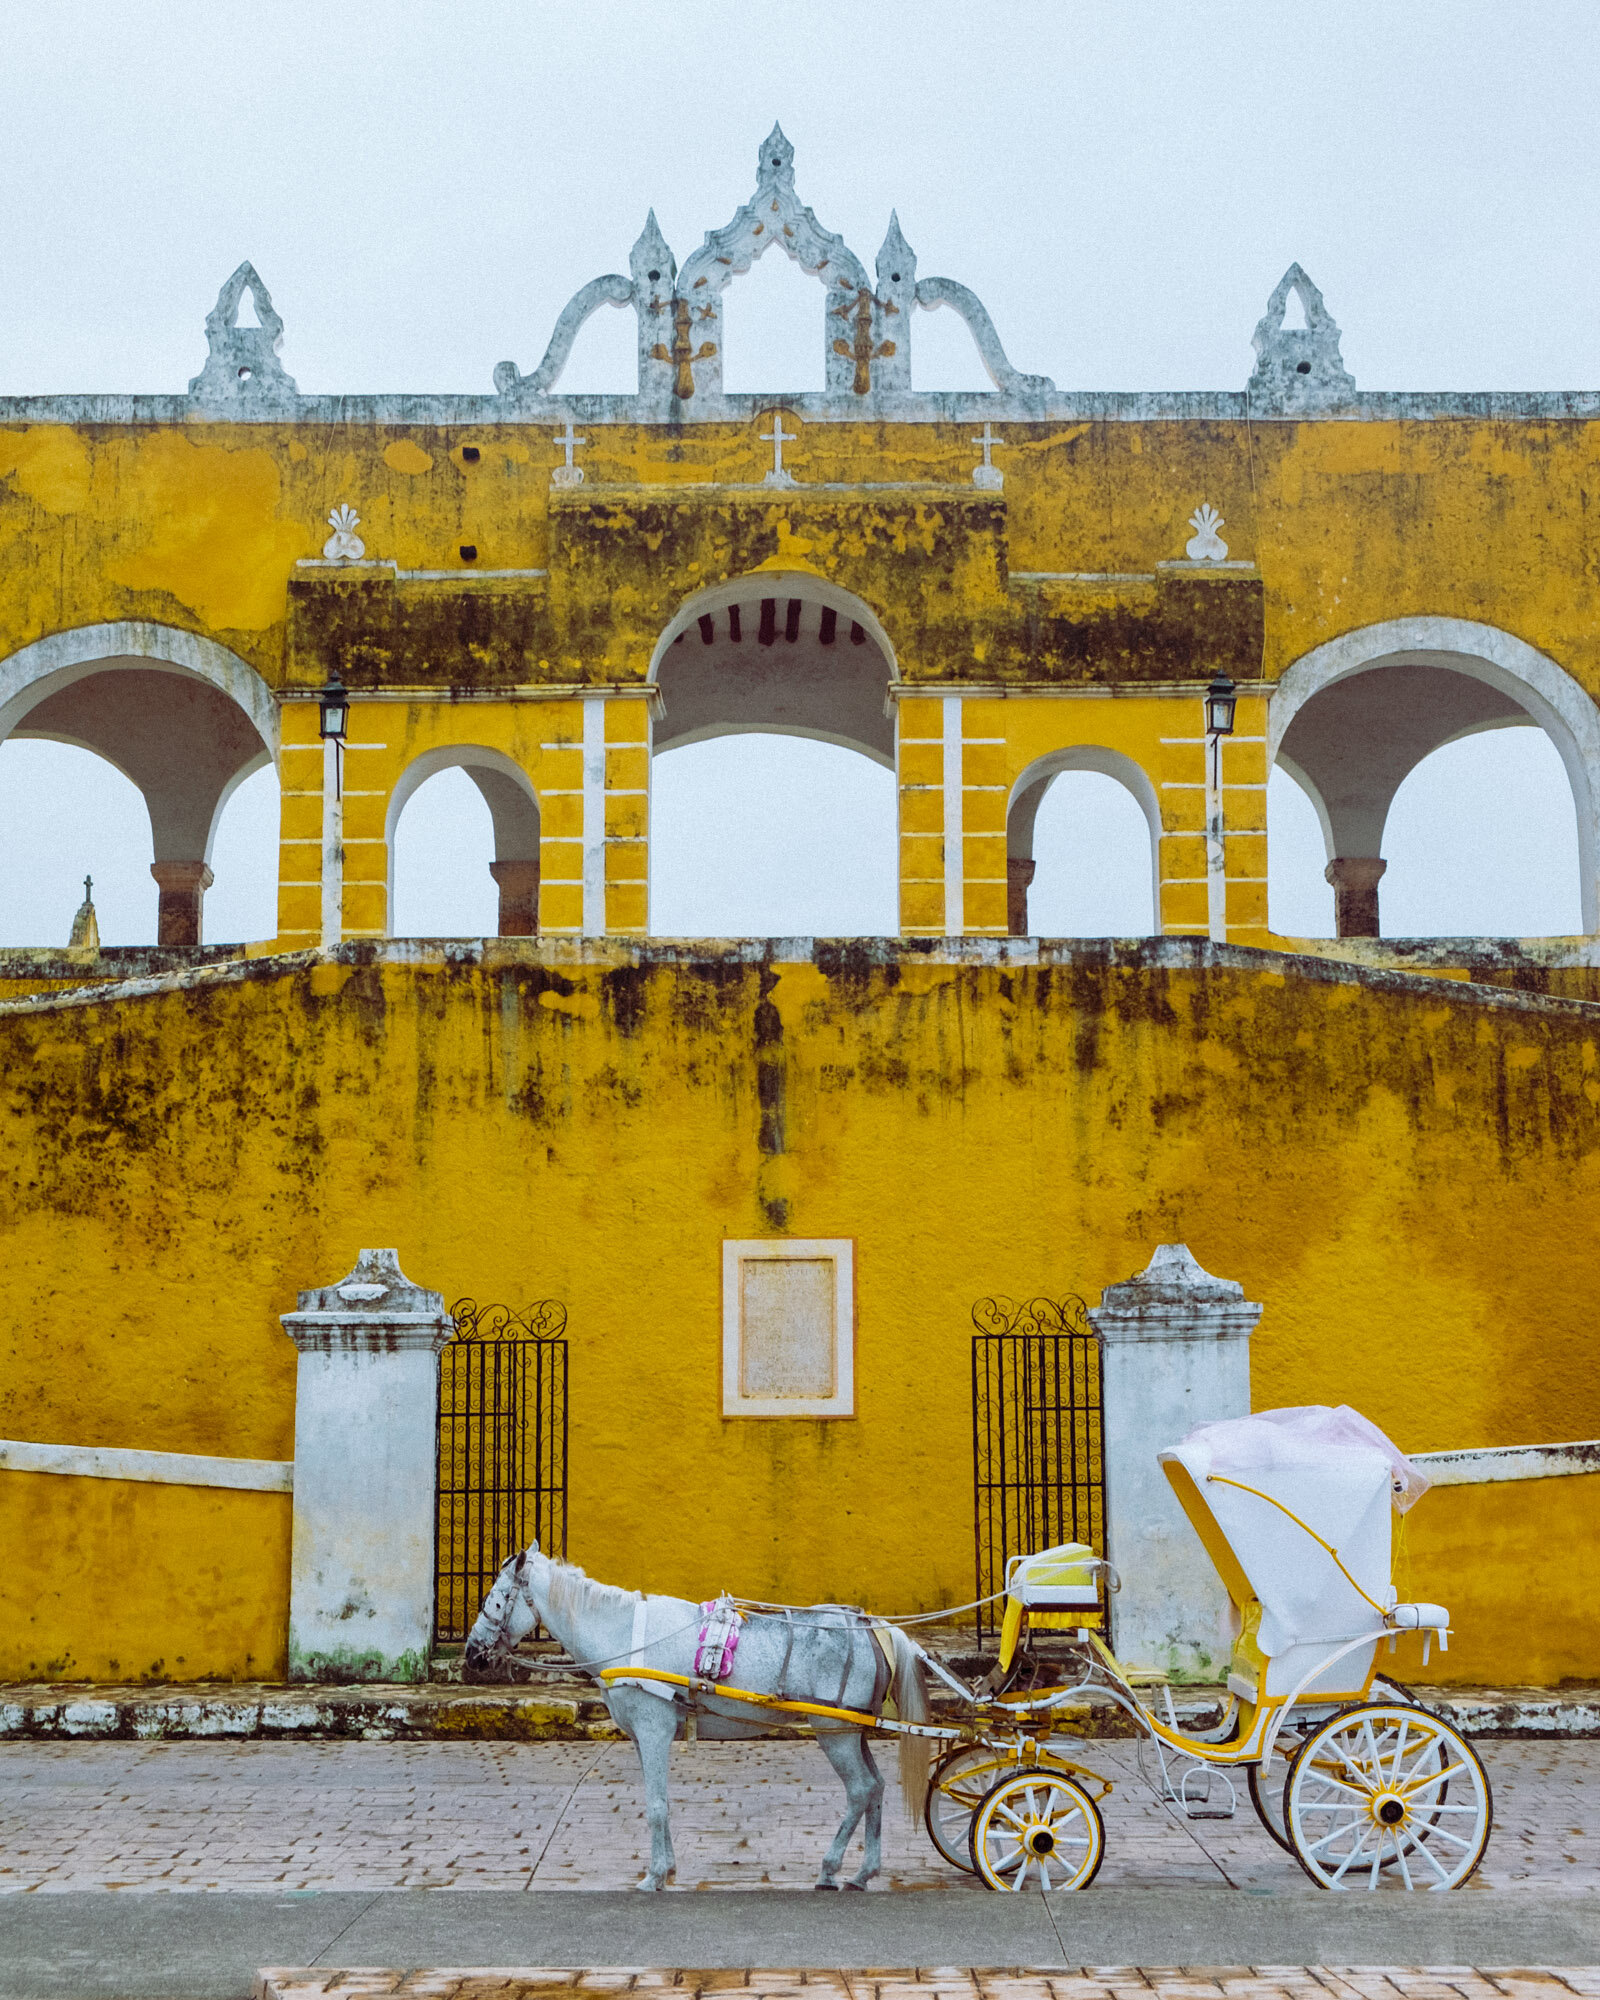 Rachel Off Duty: A Horse-Drawn Carriage in Izamal, Mexico